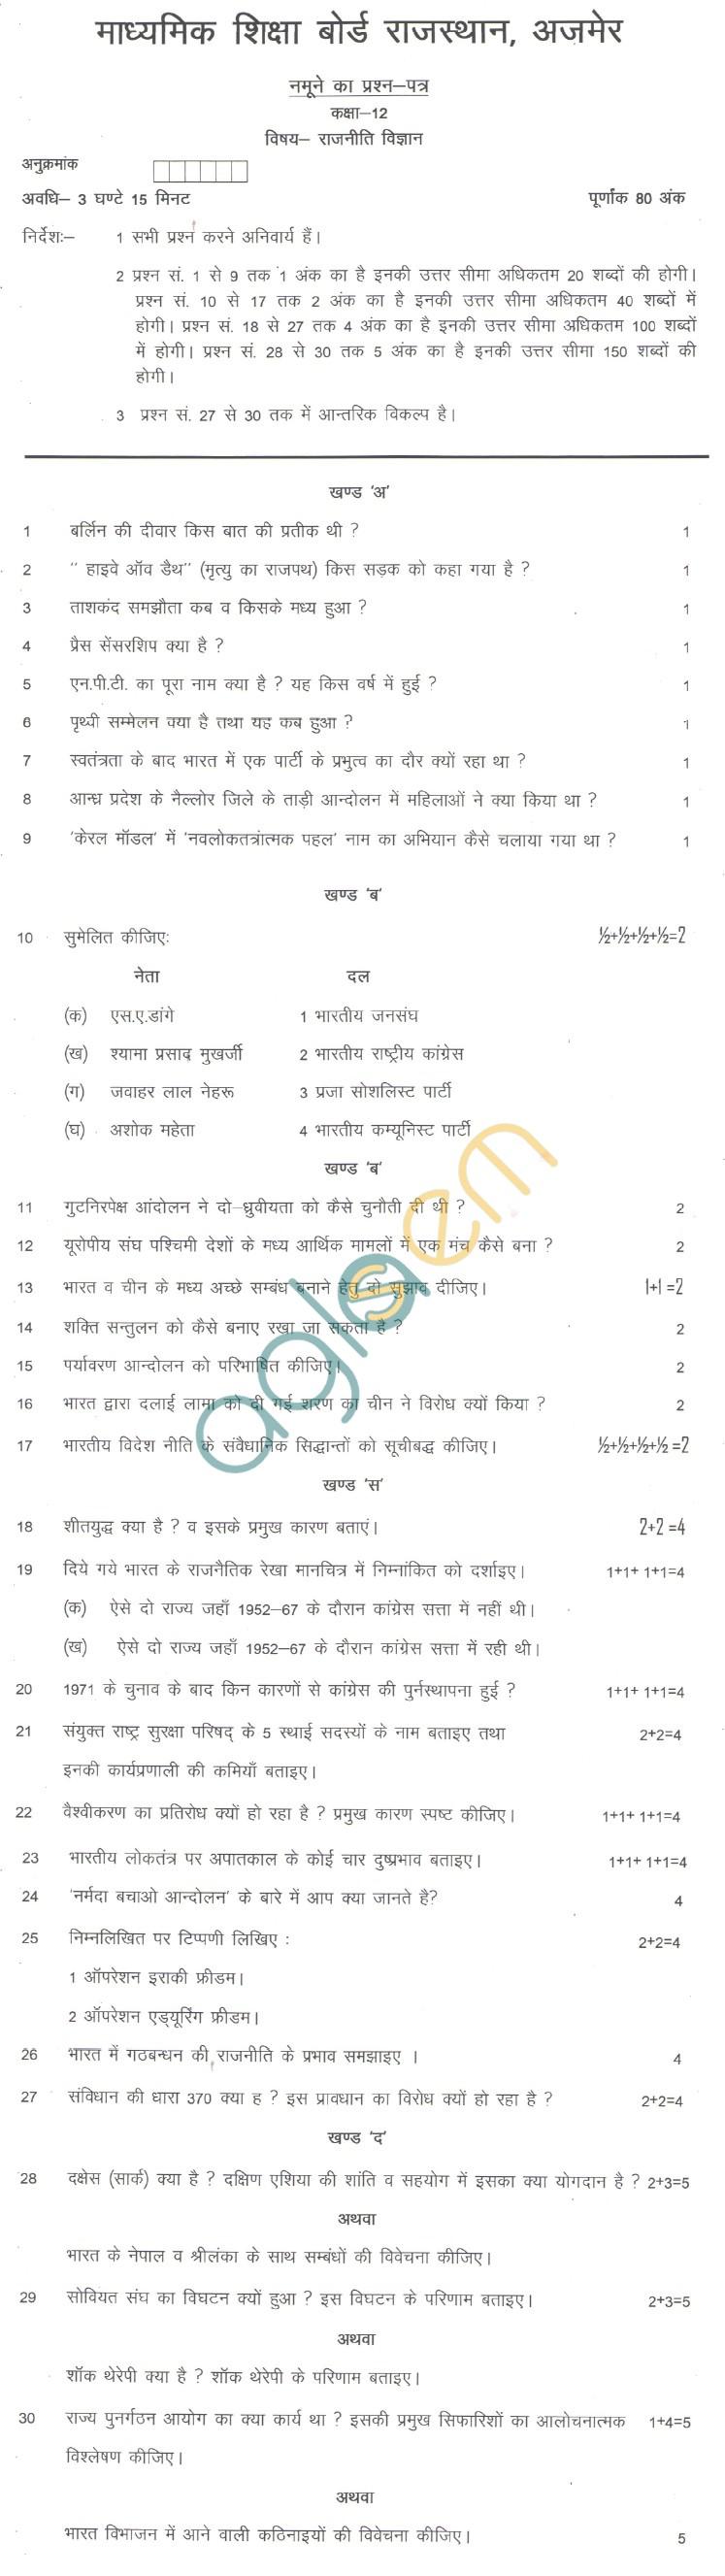 Rajasthan Board Class 12 Pol. Sci Model Question Paper